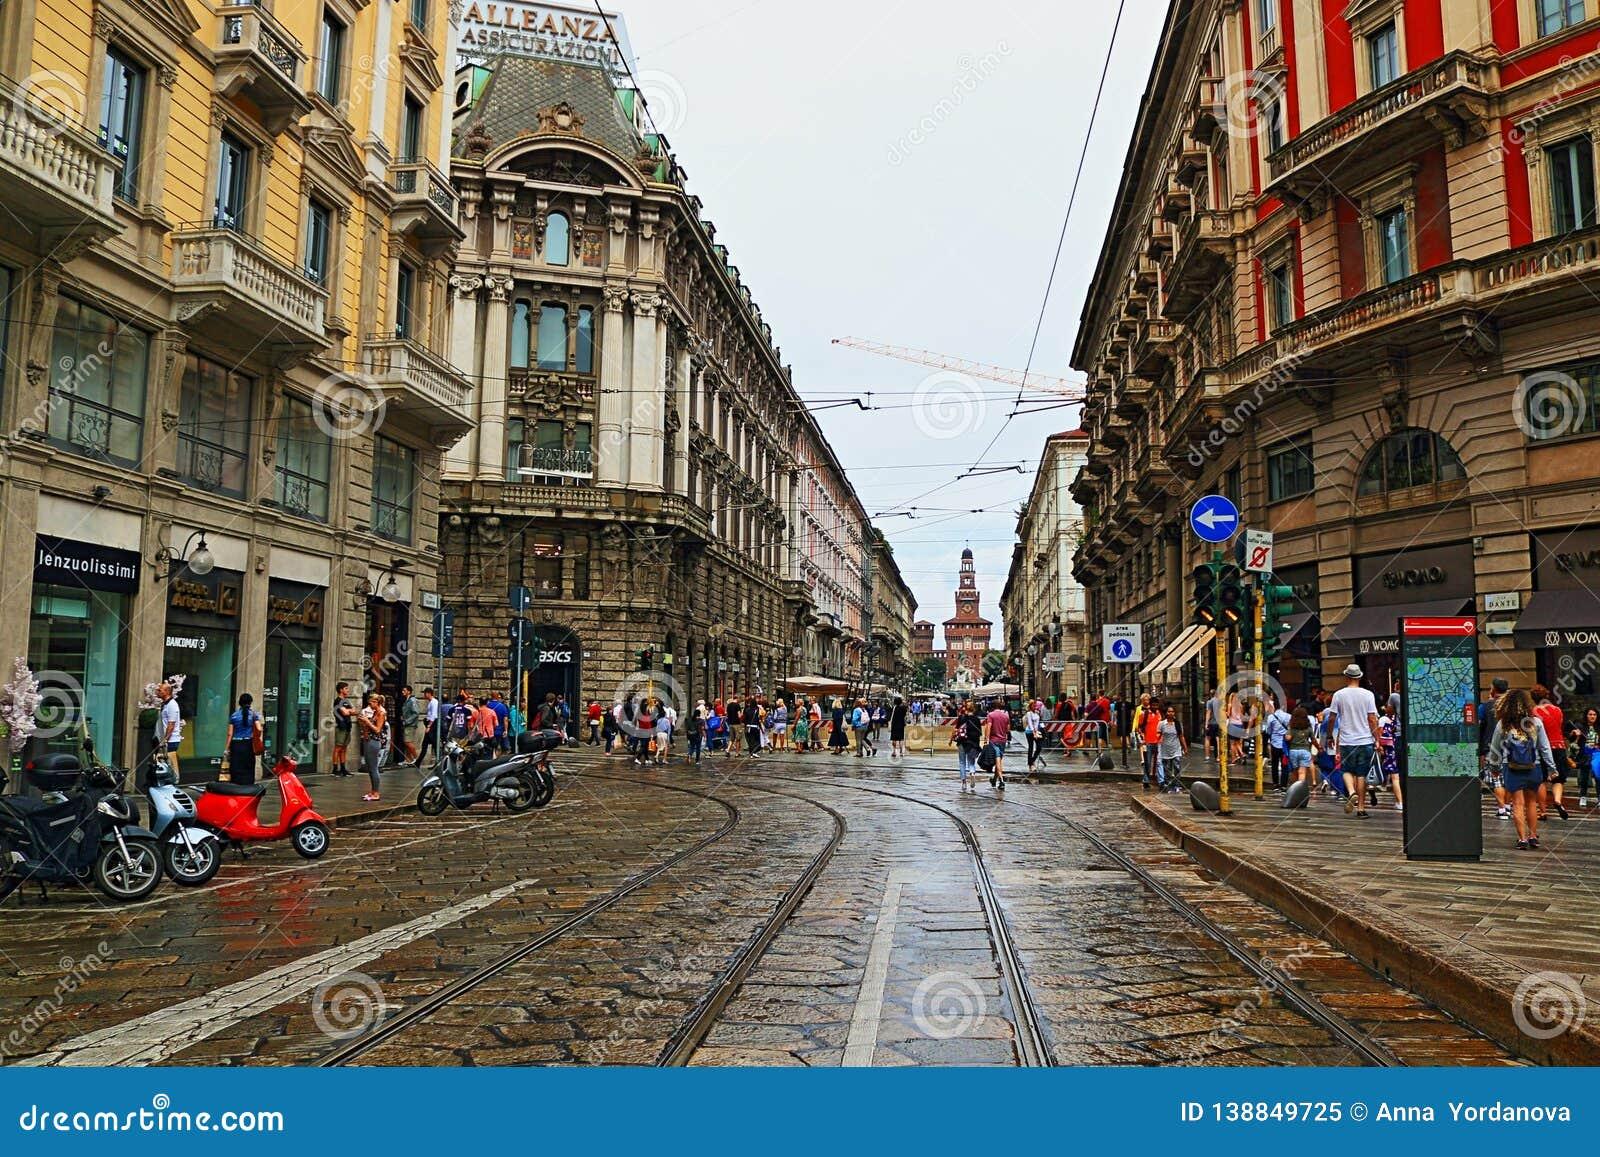 Via Dante Street Metropolitan City Of Milan Italy Editorial Image Image Of Building Network 138849725